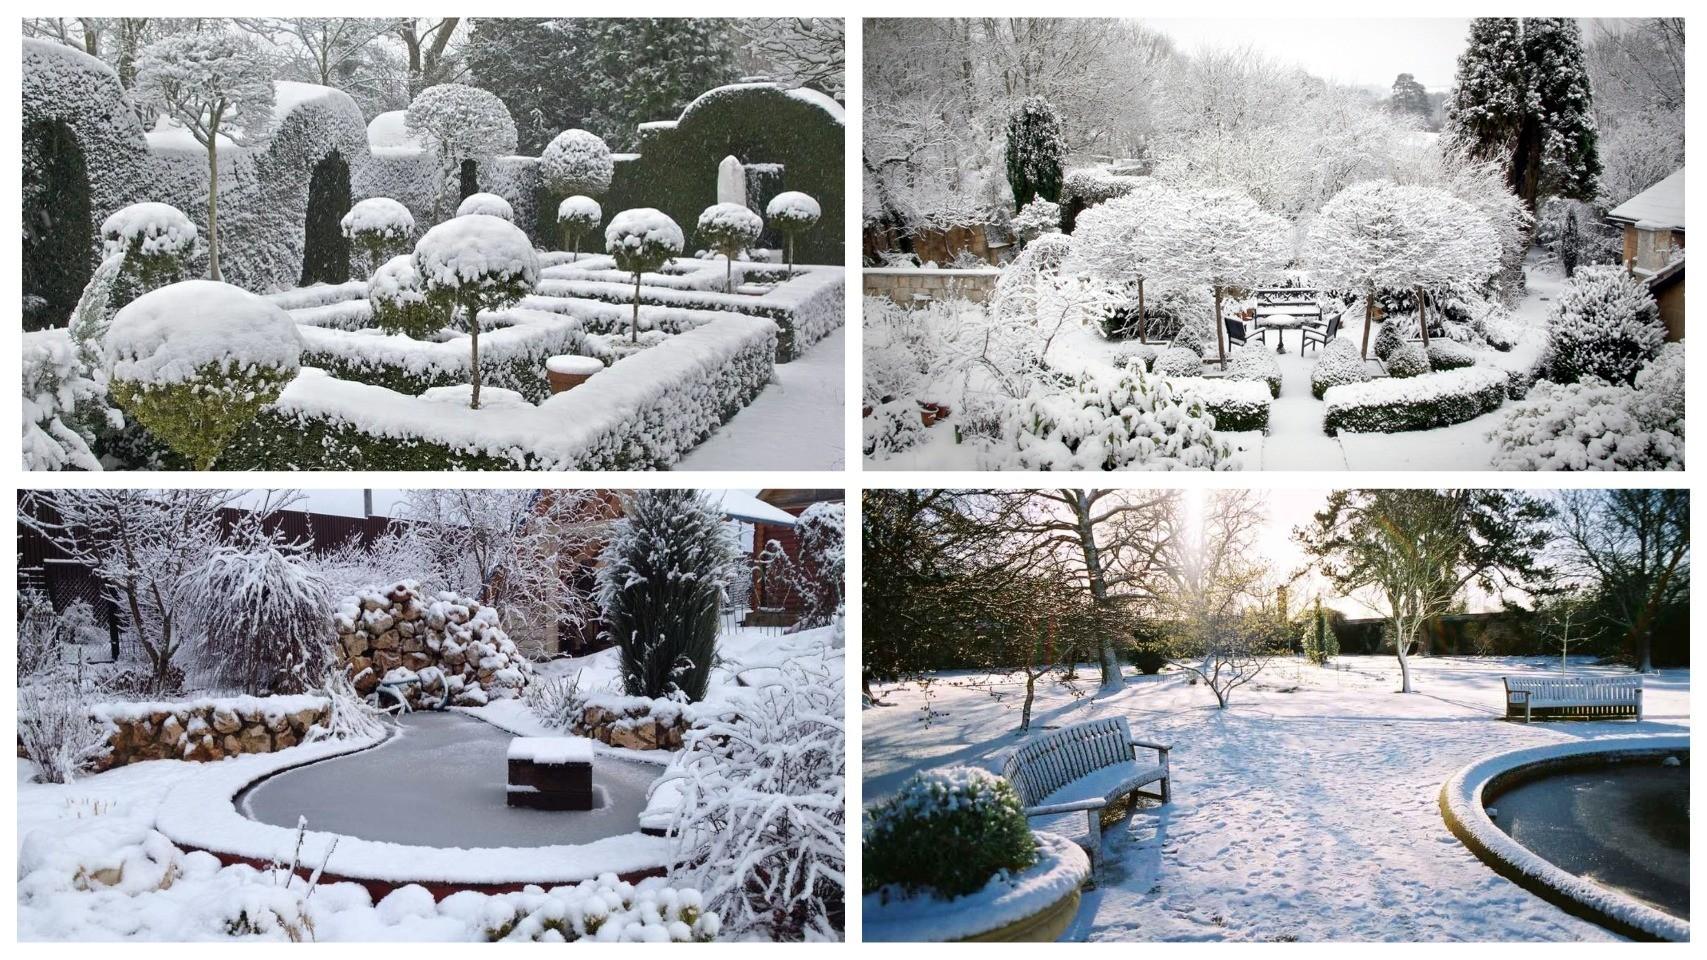 фото ландшафт в зимний период